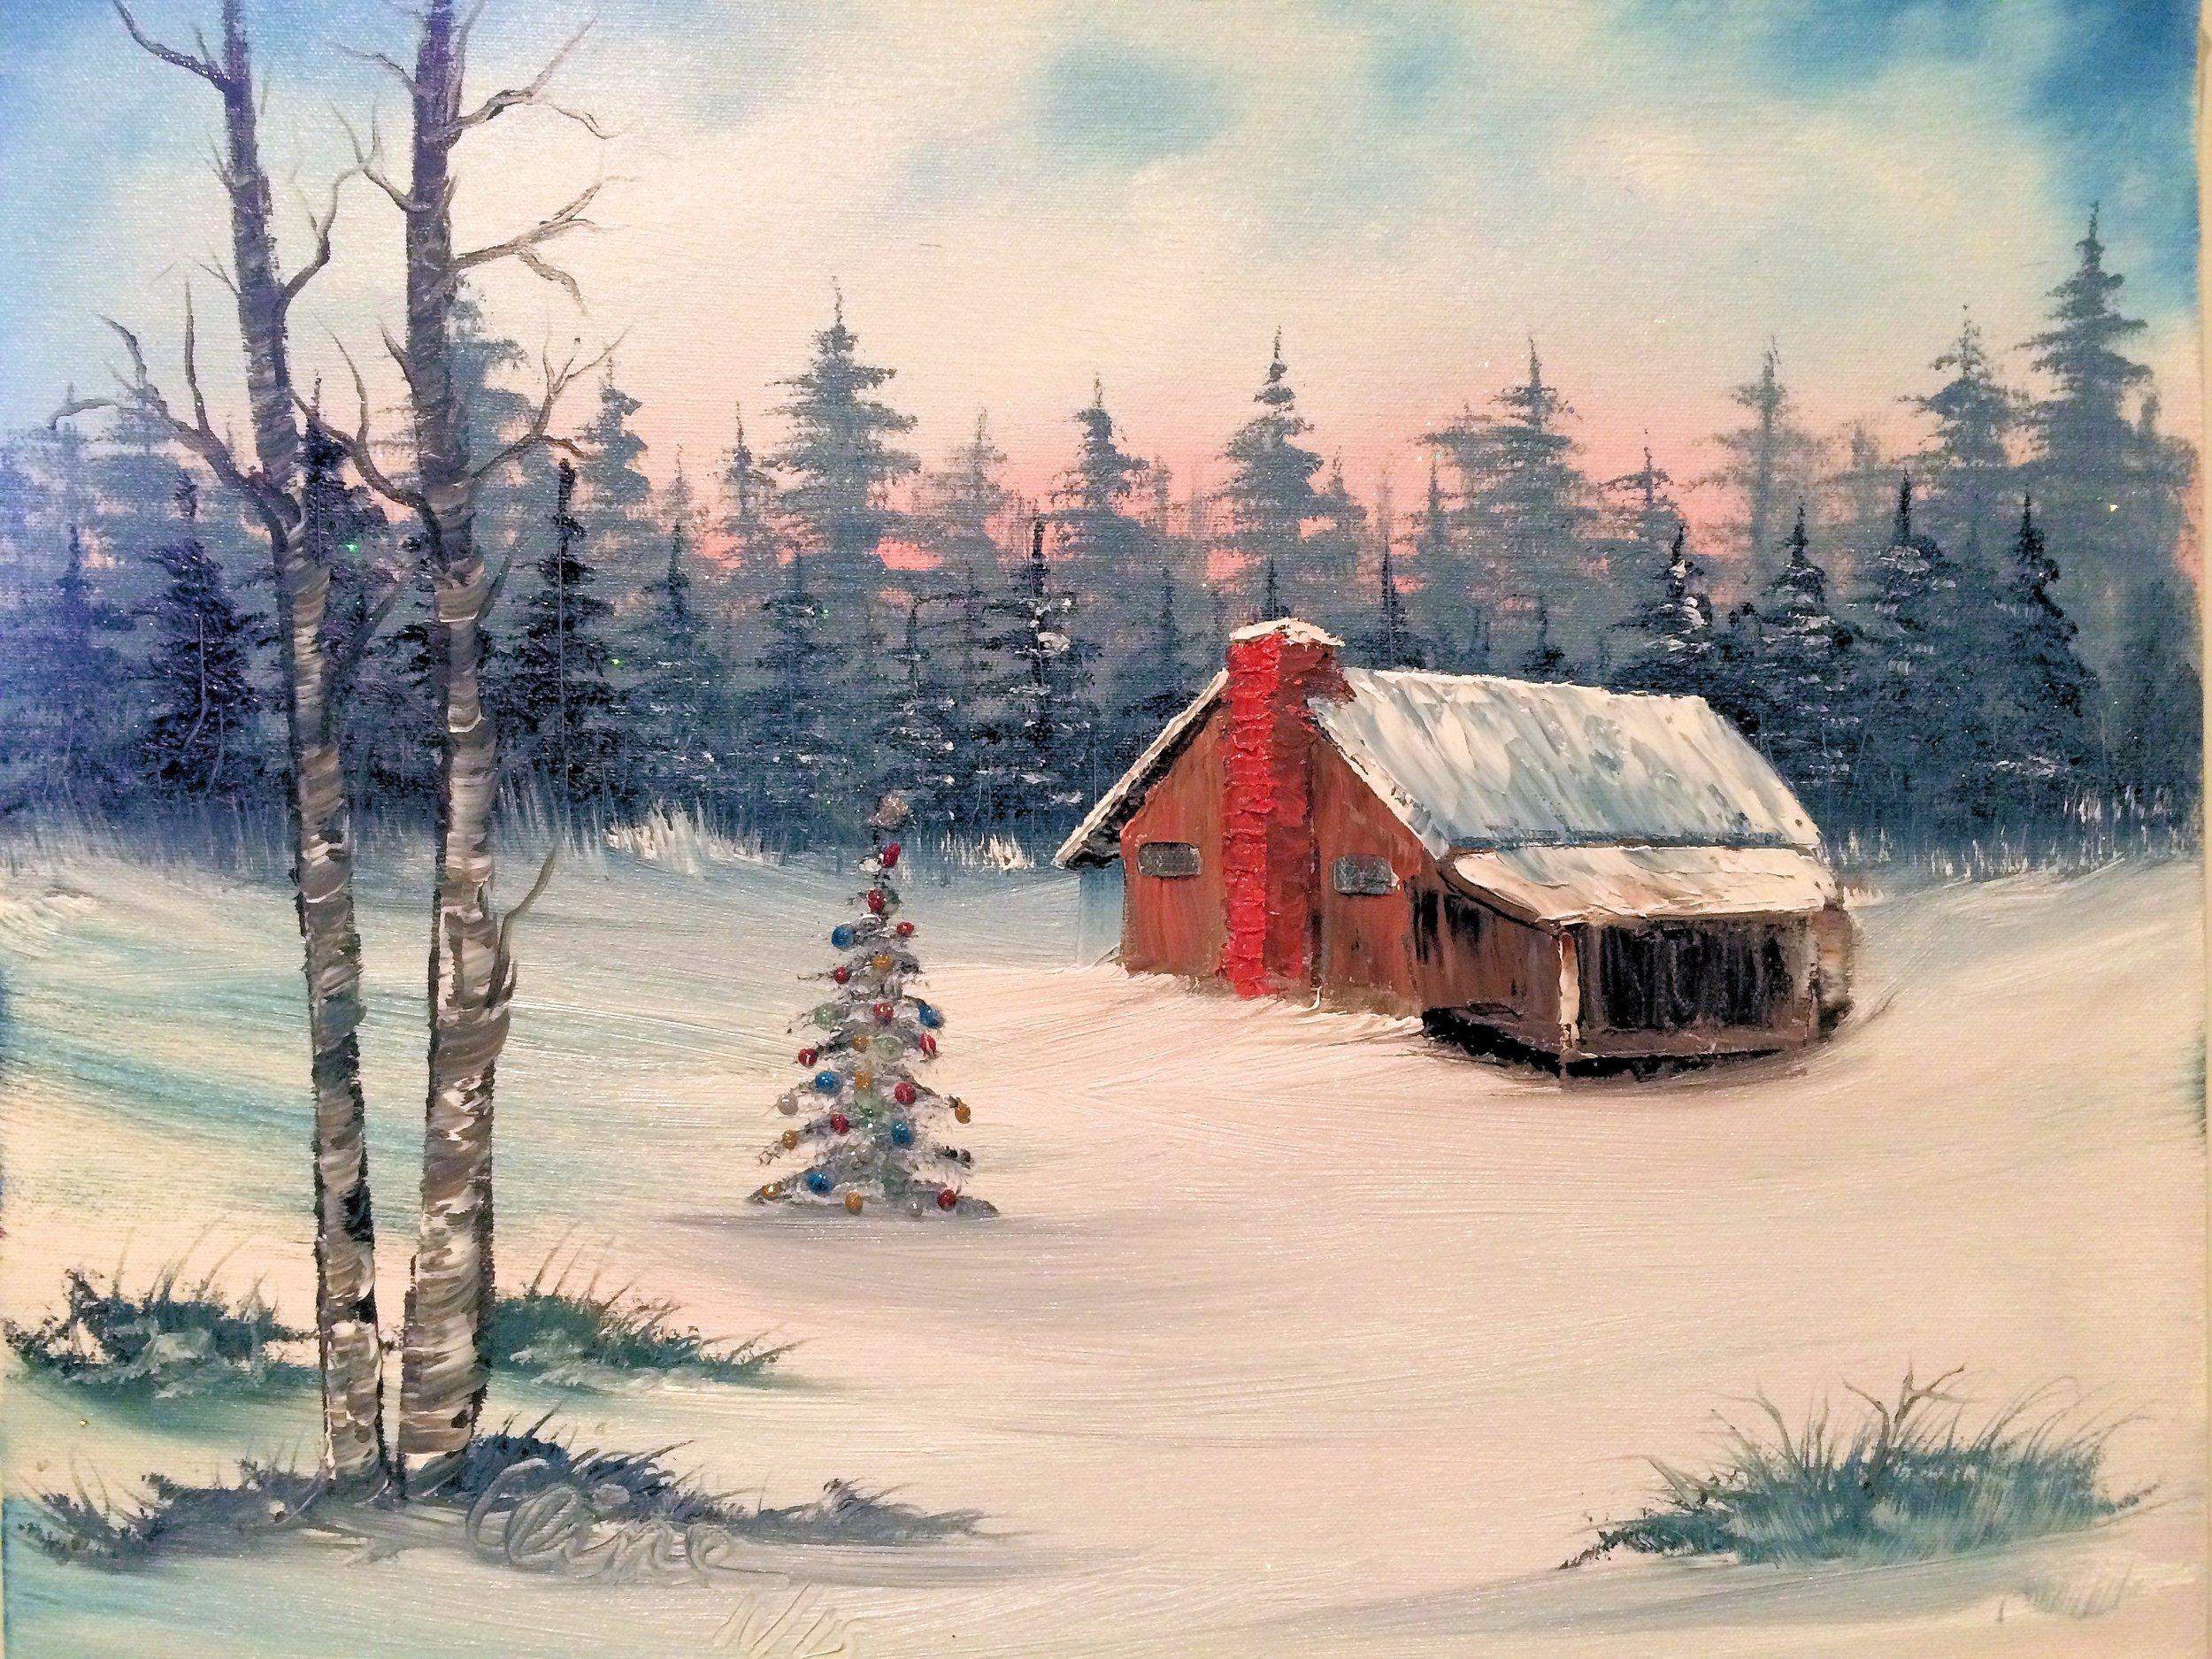 Country Cabin at Christmas.JPG